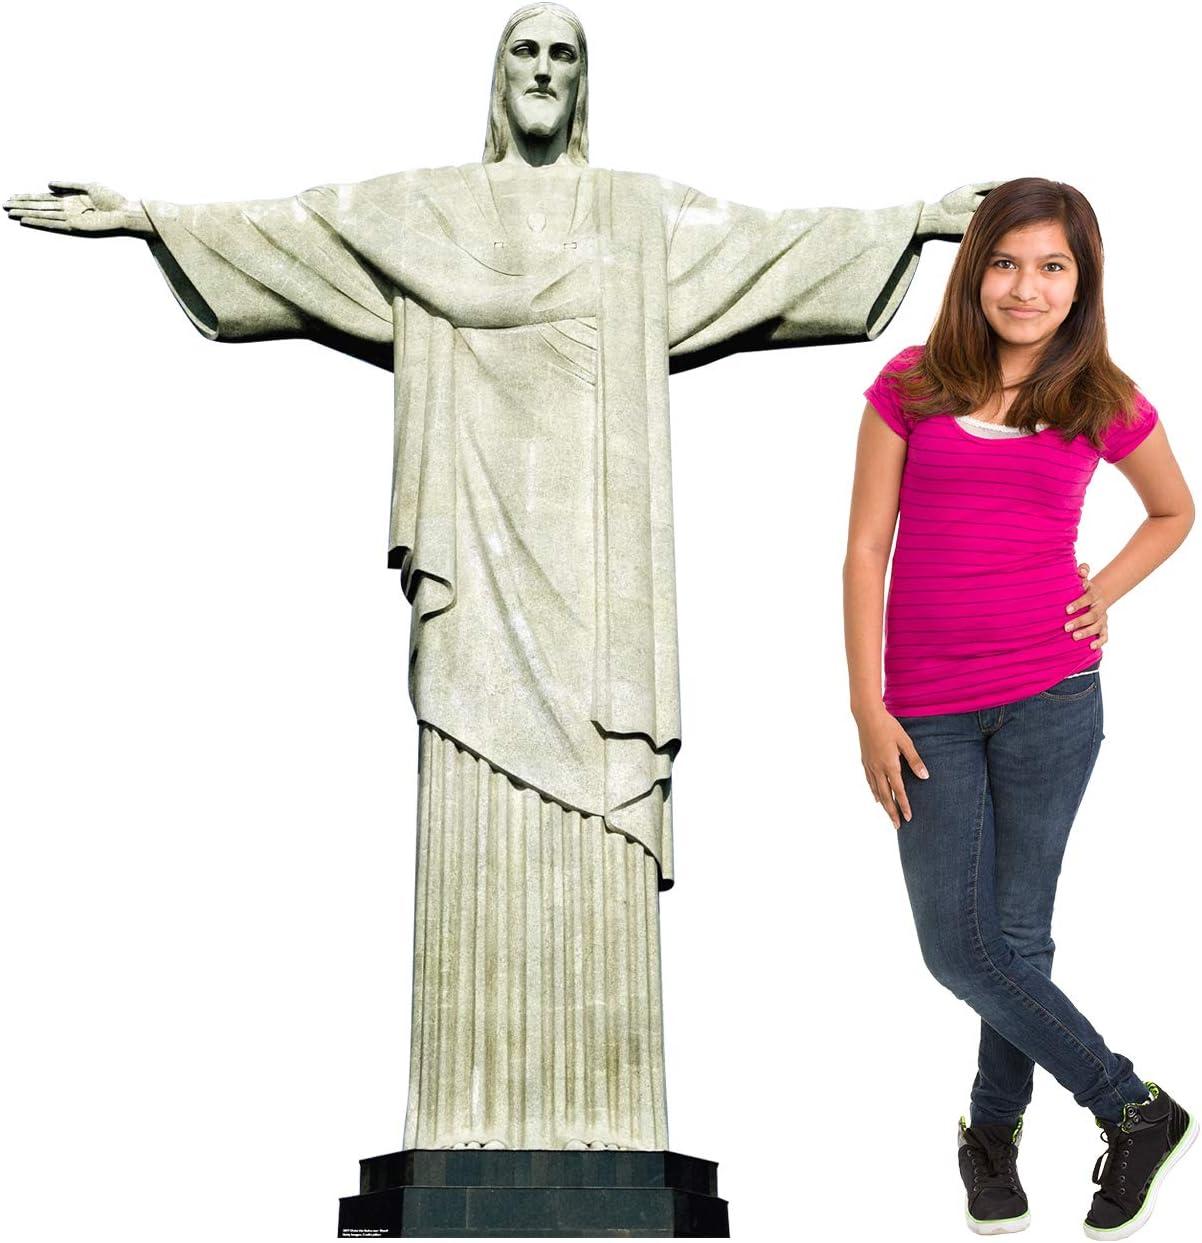 Advanced Graphics Christ The Redeemer Statue in Brazil Life Size Cardboard Cutout Standup